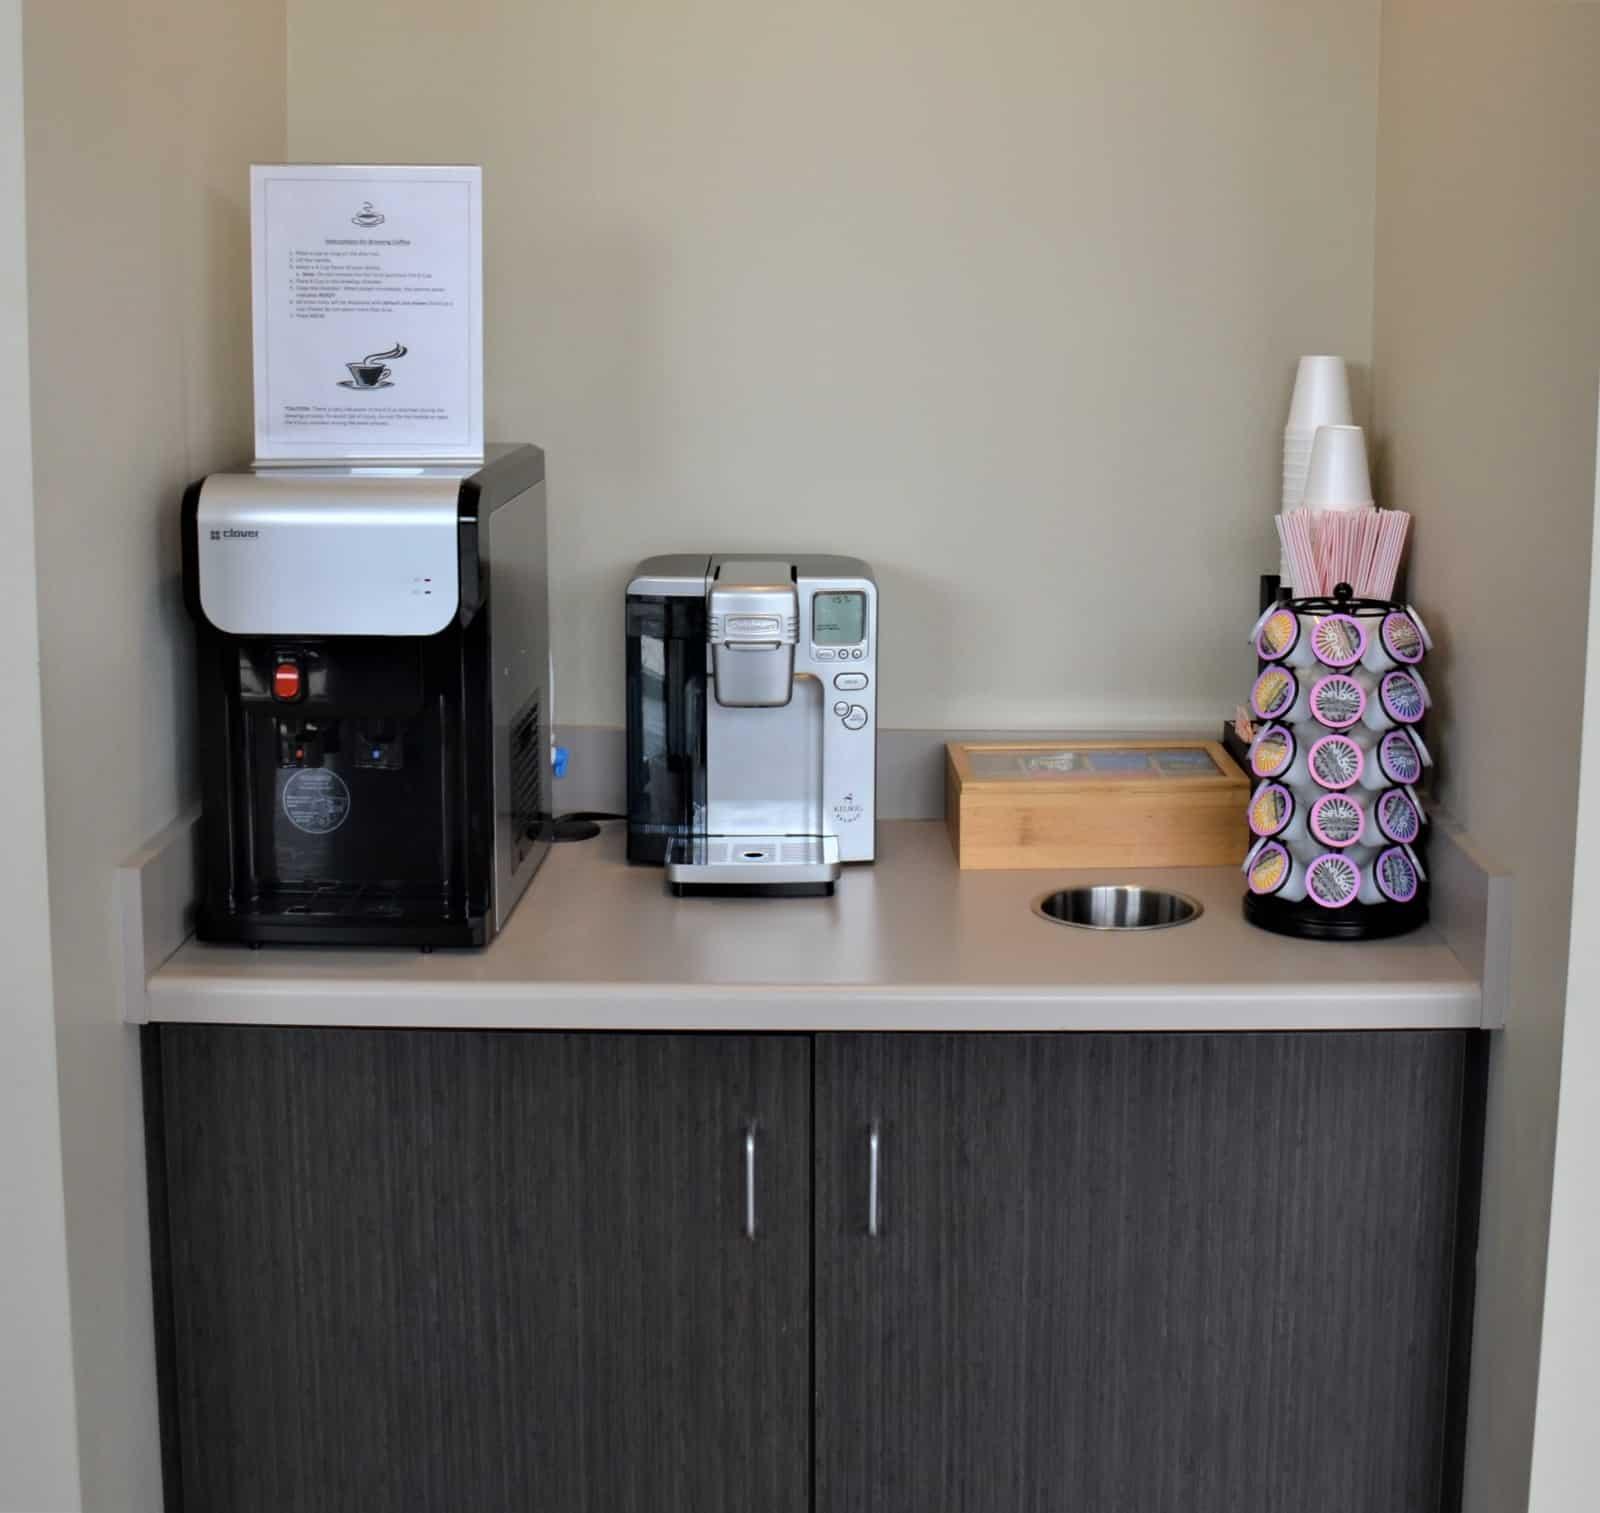 Mediq Urgent Care Greensboro Waiting Room Refreshments